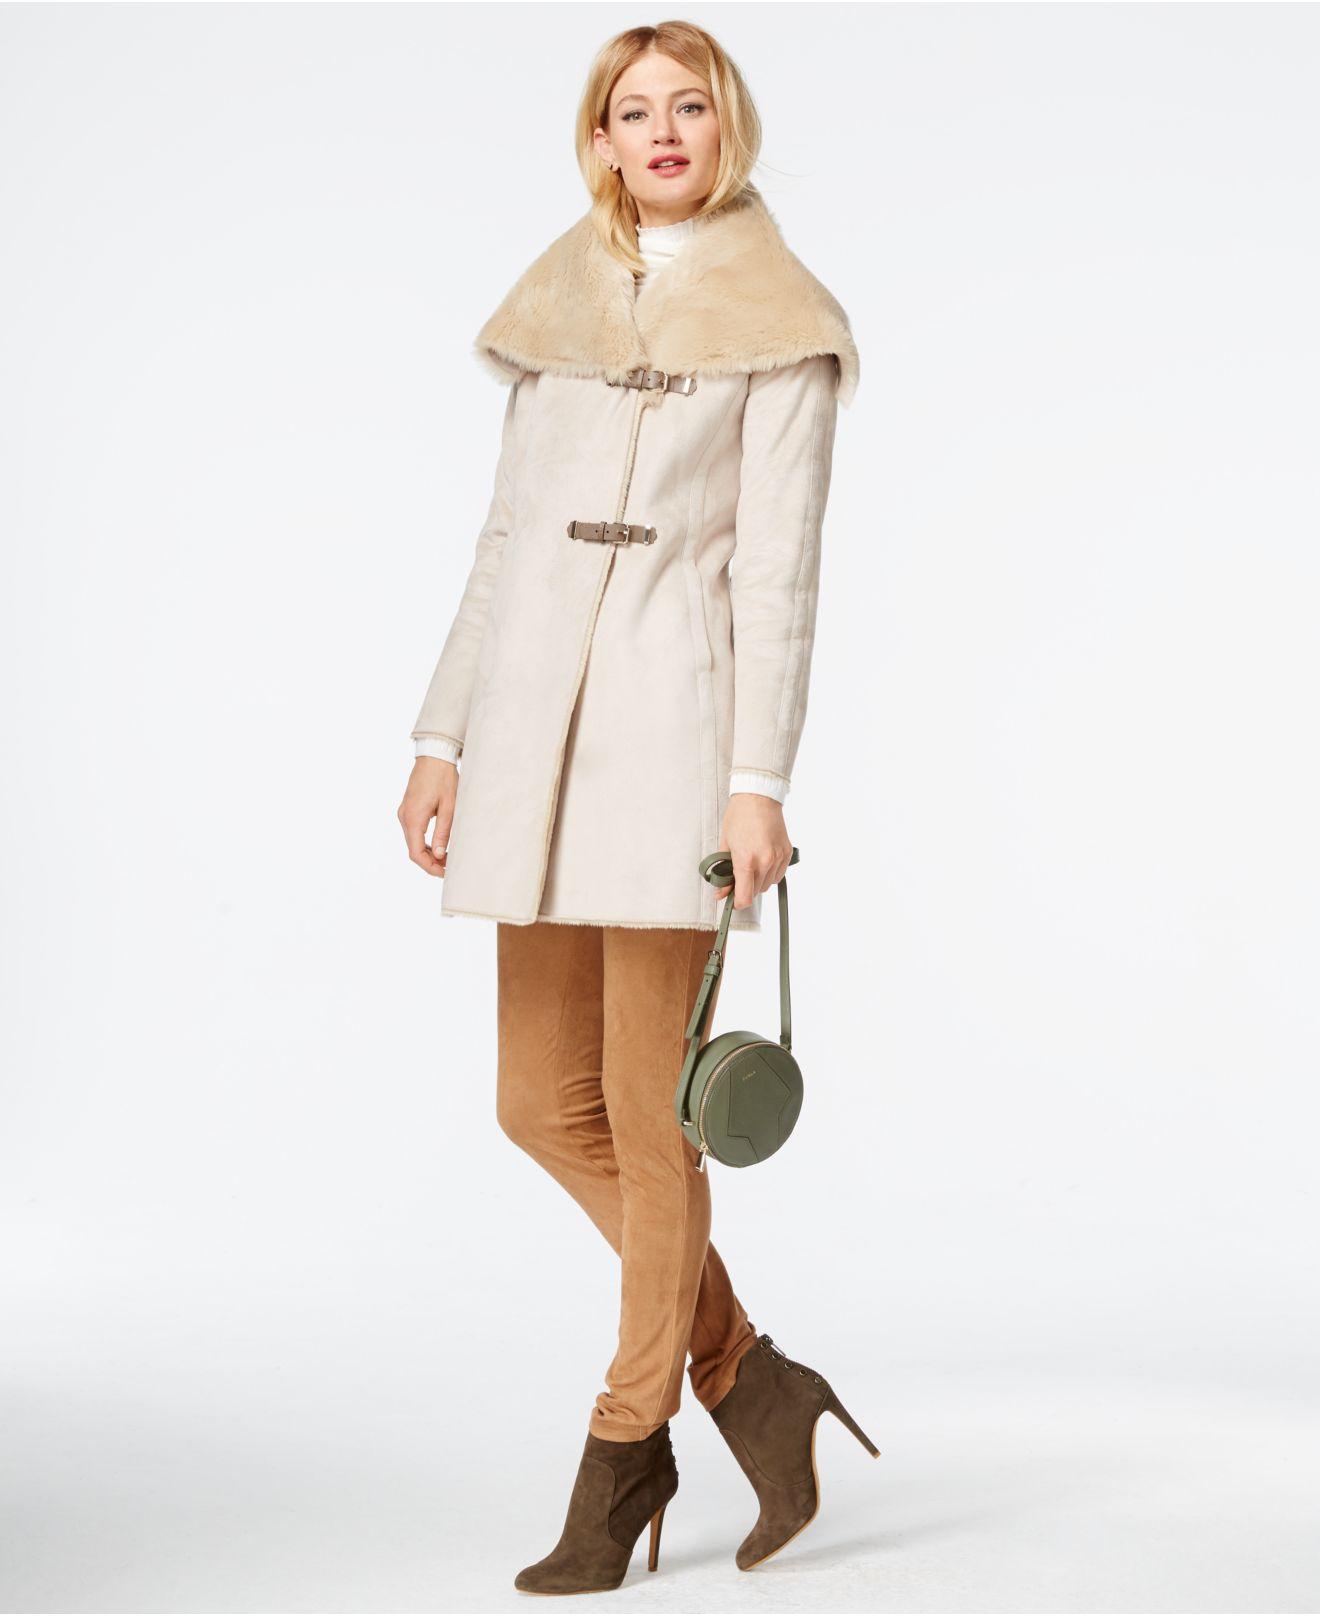 b6cb5d73c1db Calvin Klein Faux-shearling Asymmetrical Buckled Coat in Natural - Lyst